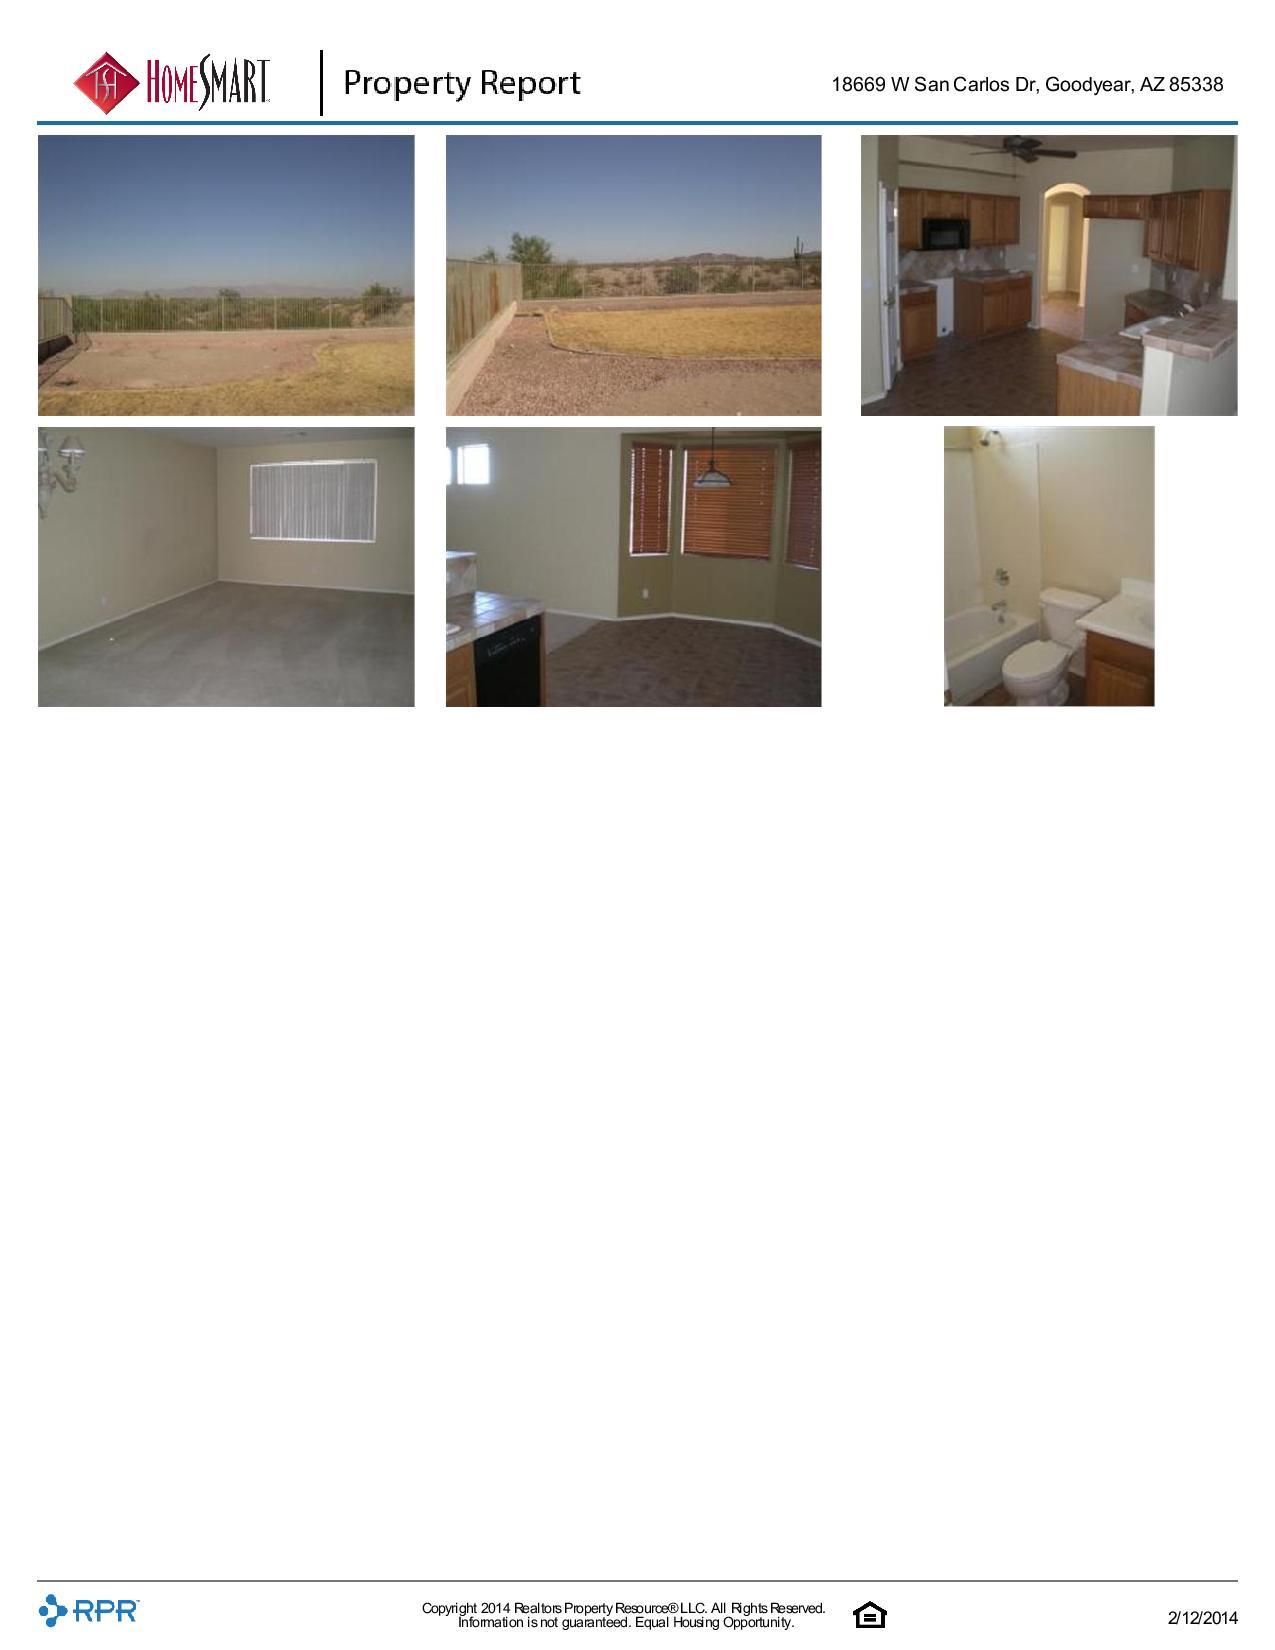 18669-W-San-Carlos-Dr-Goodyear-AZ-85338-page-006